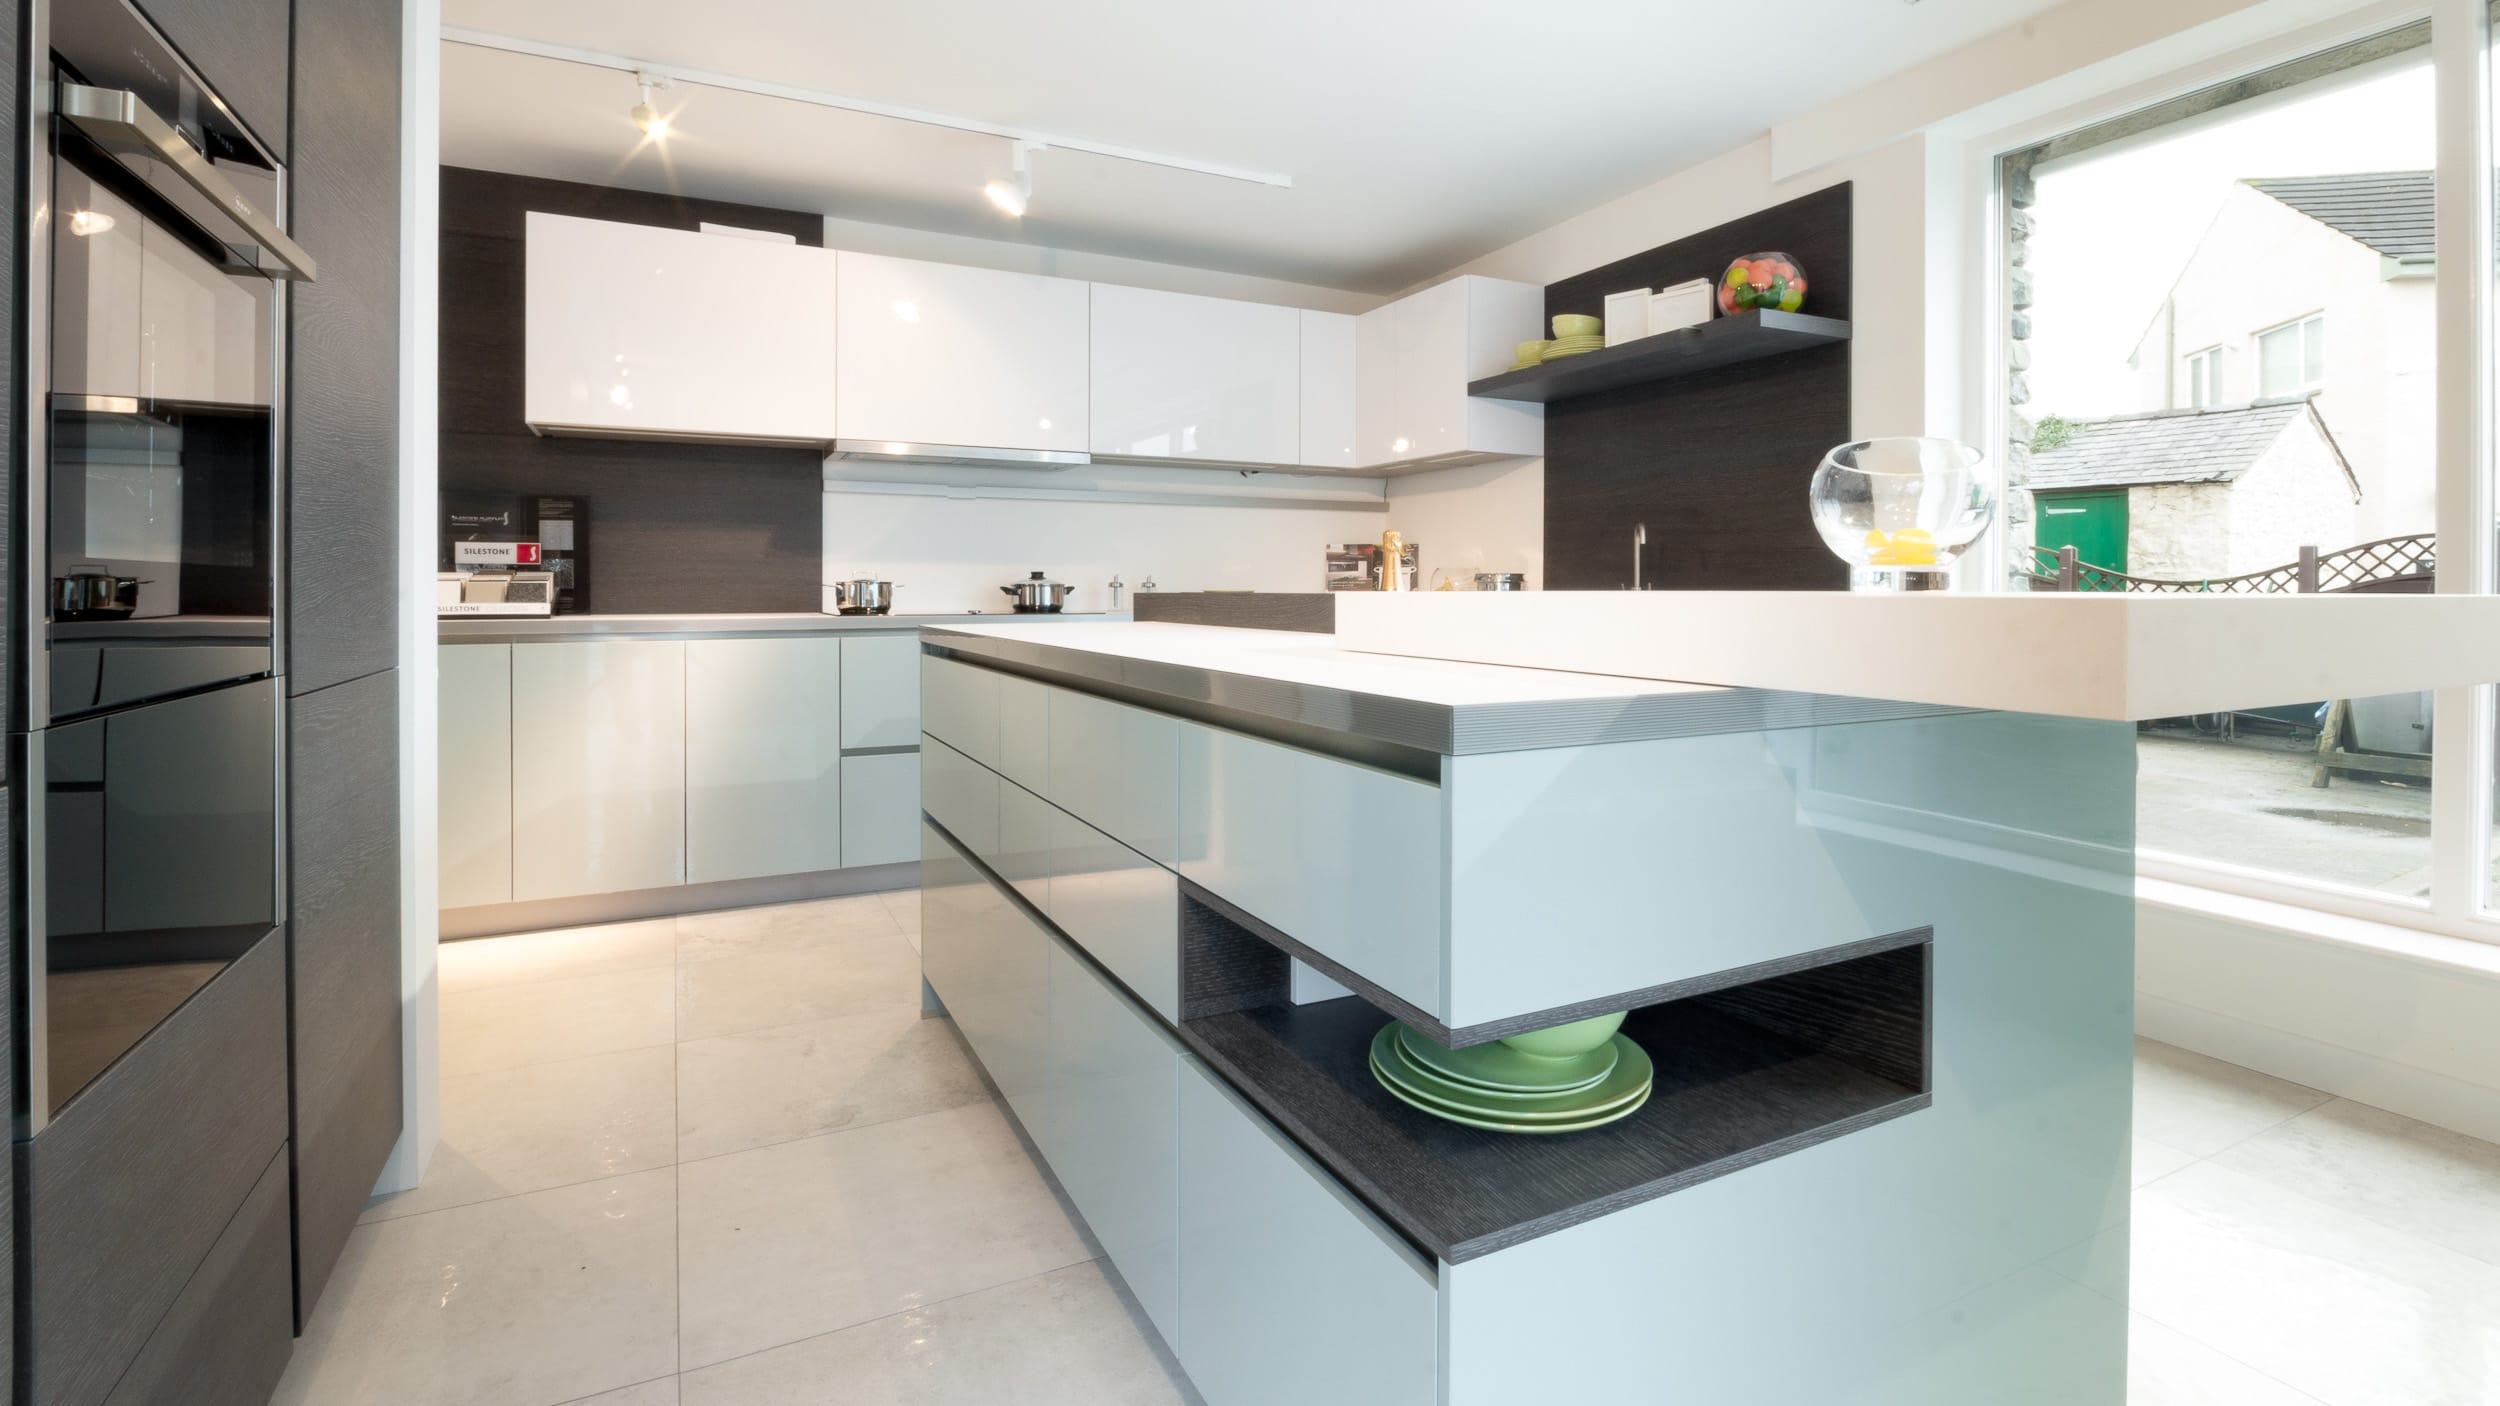 Kitchen-Showroom-Webbs-Kendal-1.jpg